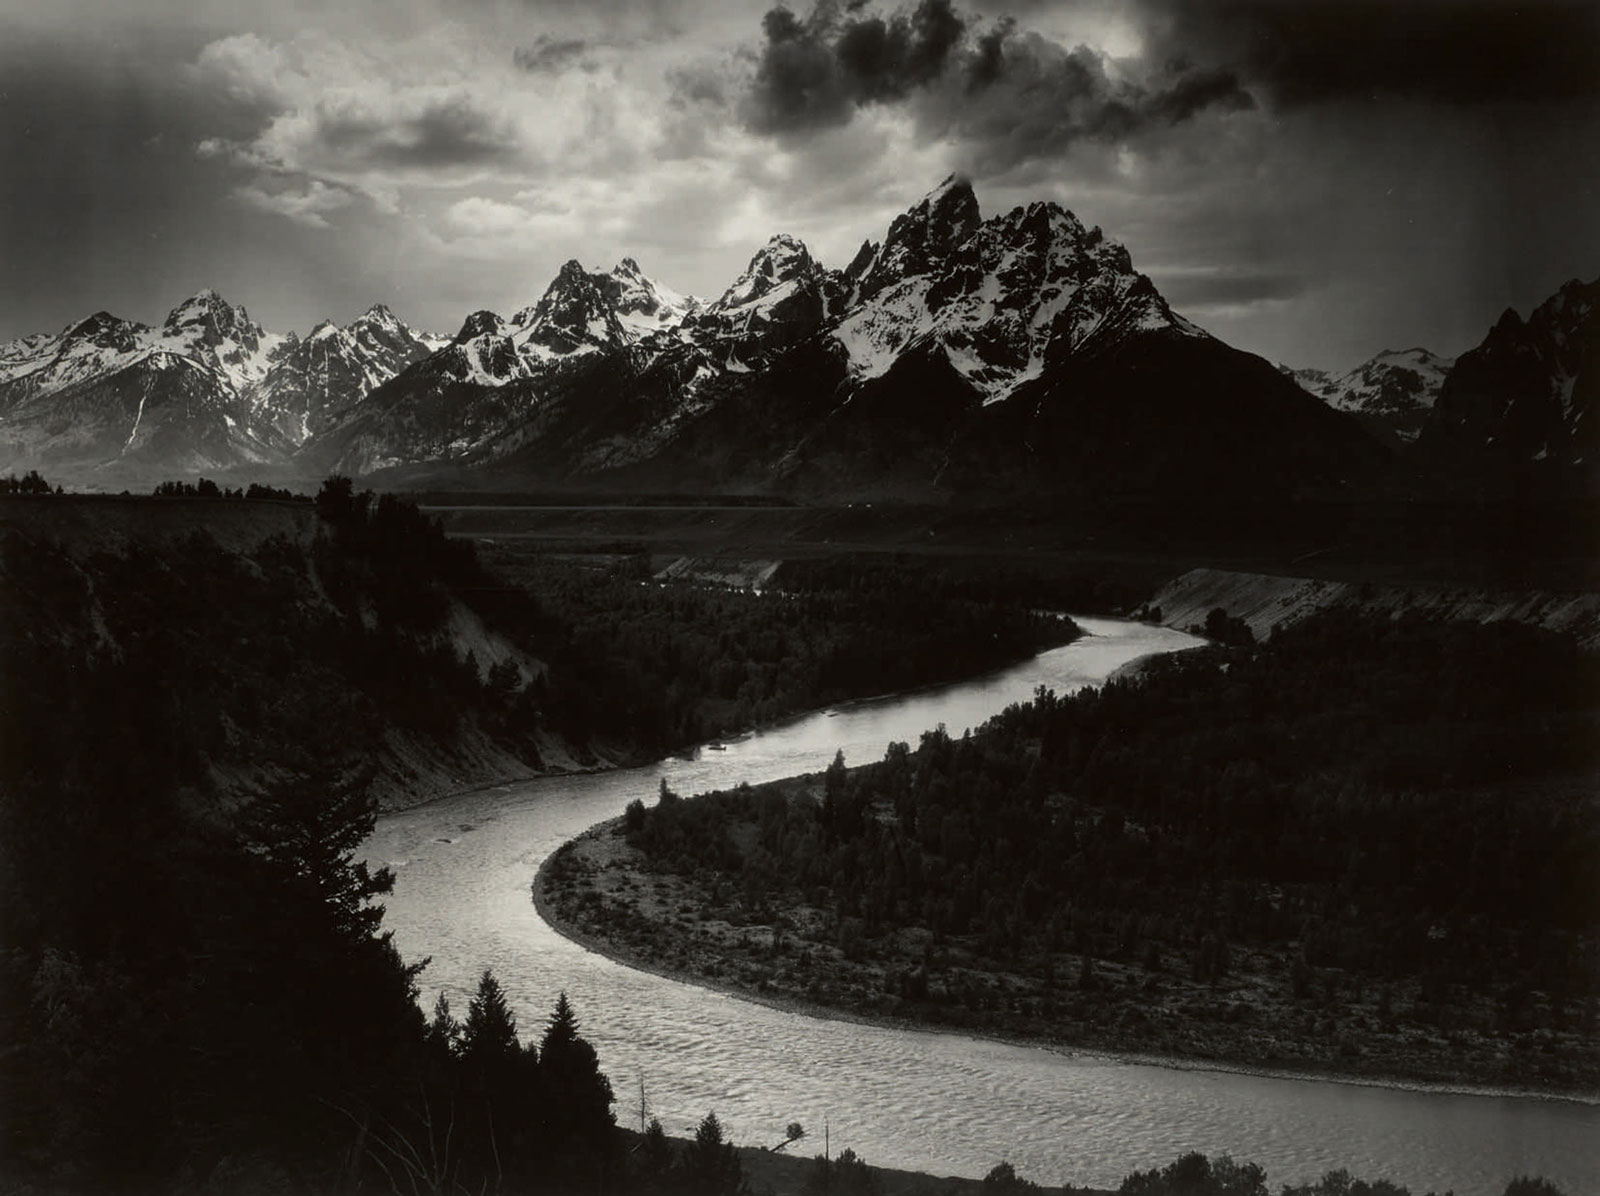 L'iconica fotografia di Ansel Adams venduta per 1 milione di dollari thumbnail